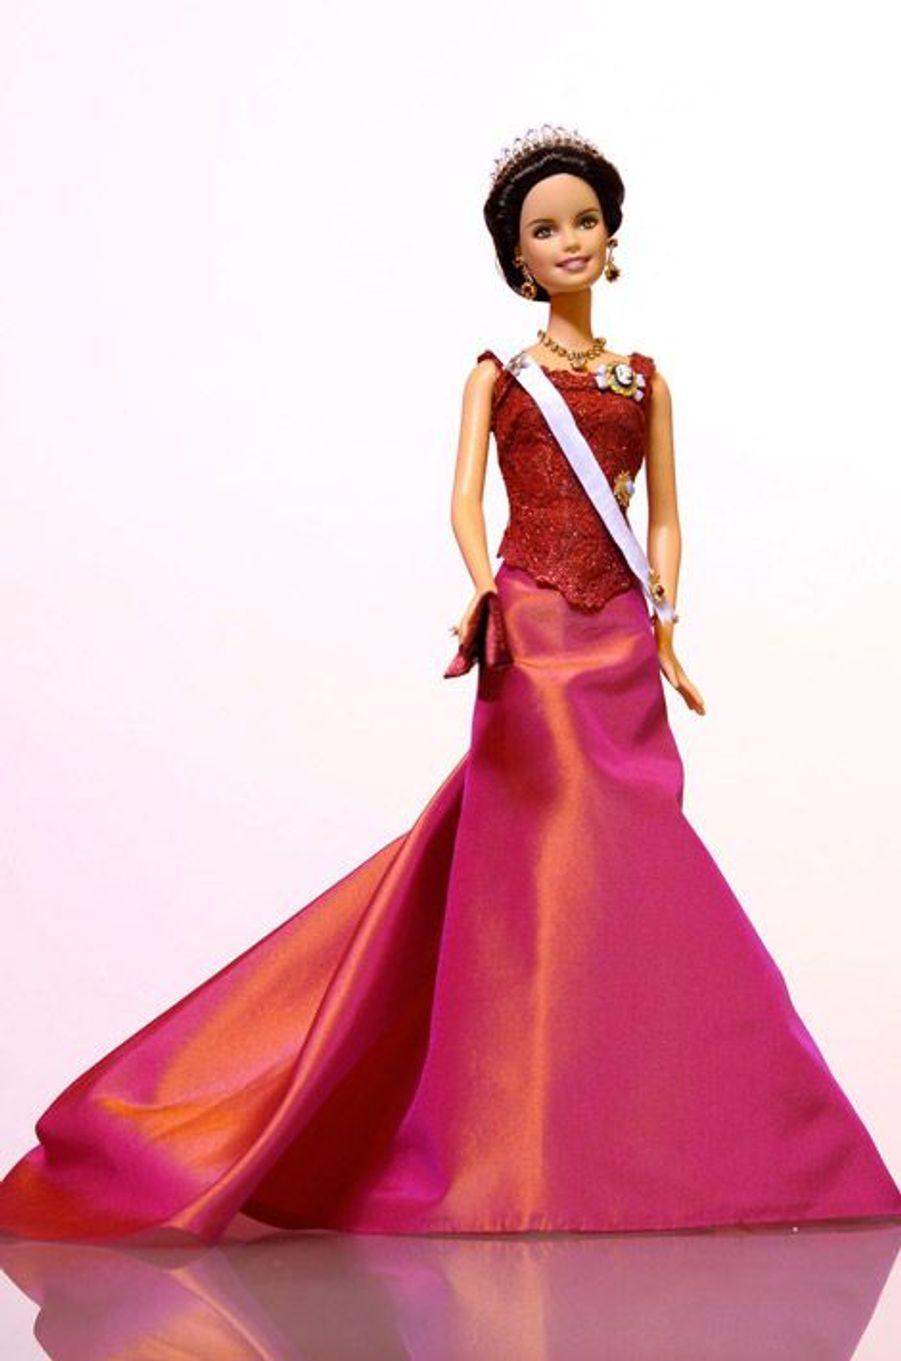 La Barbie inspirée de la princesse Victoria de Suède